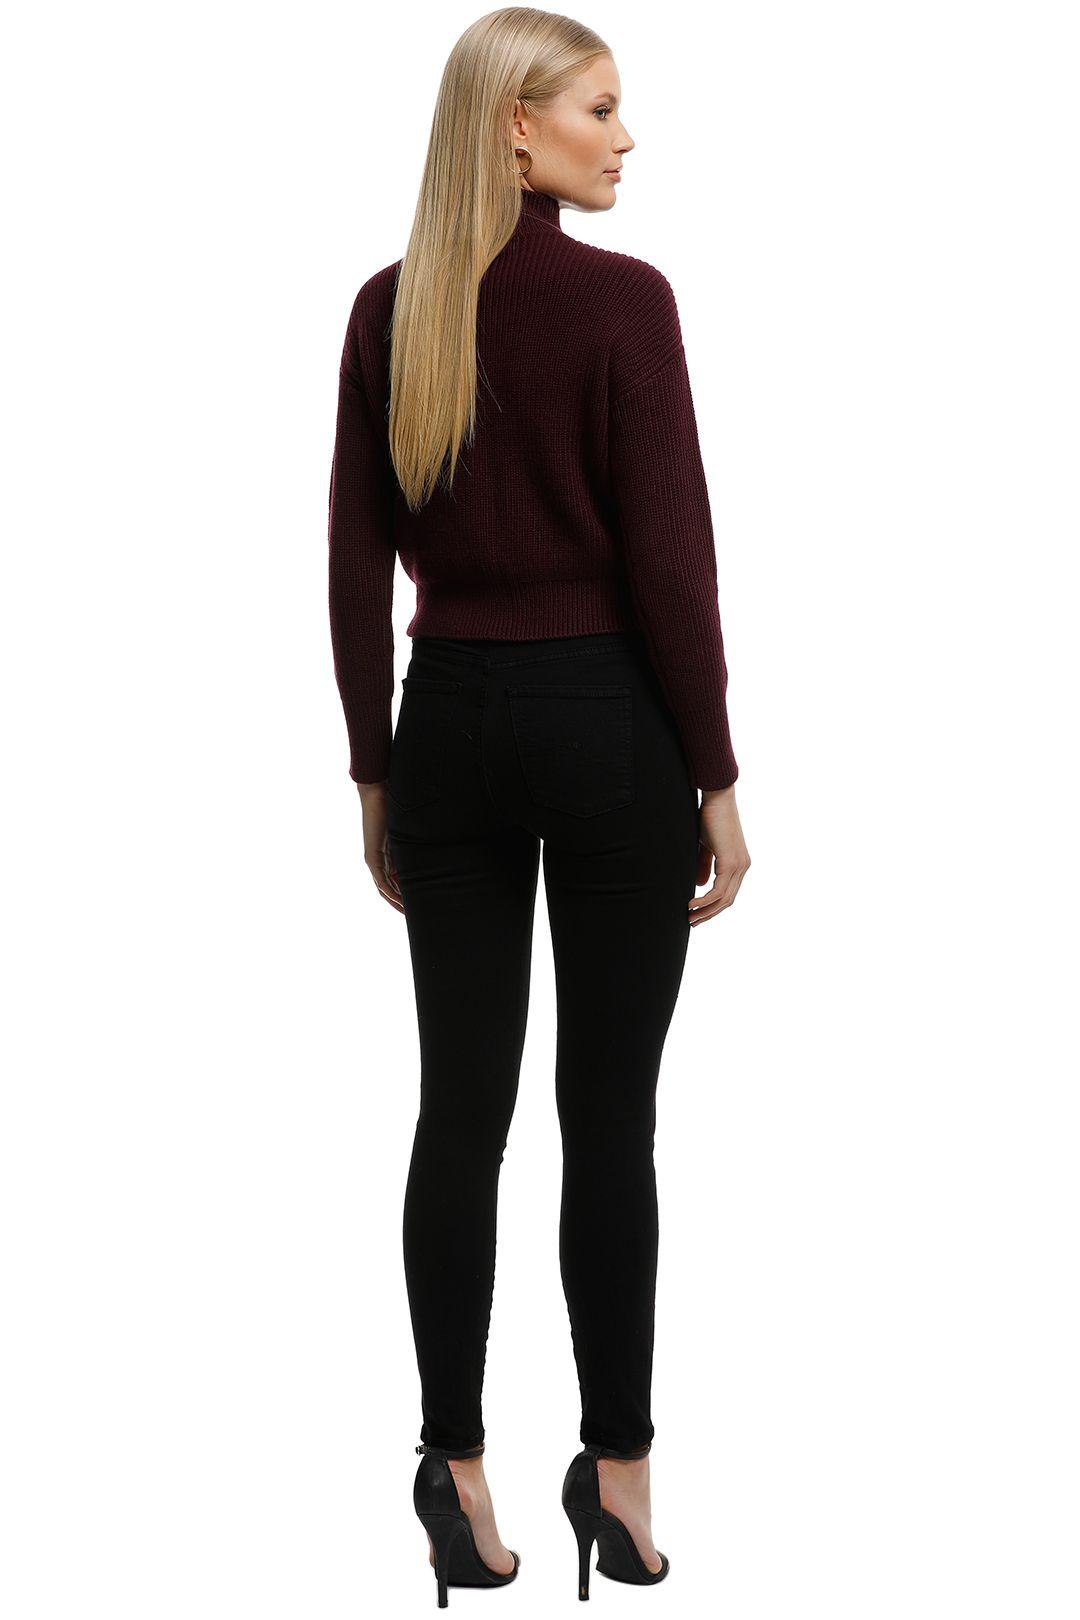 Nobody-Denim-Cult-Skinny-Ankle-Jeans-Black-Back